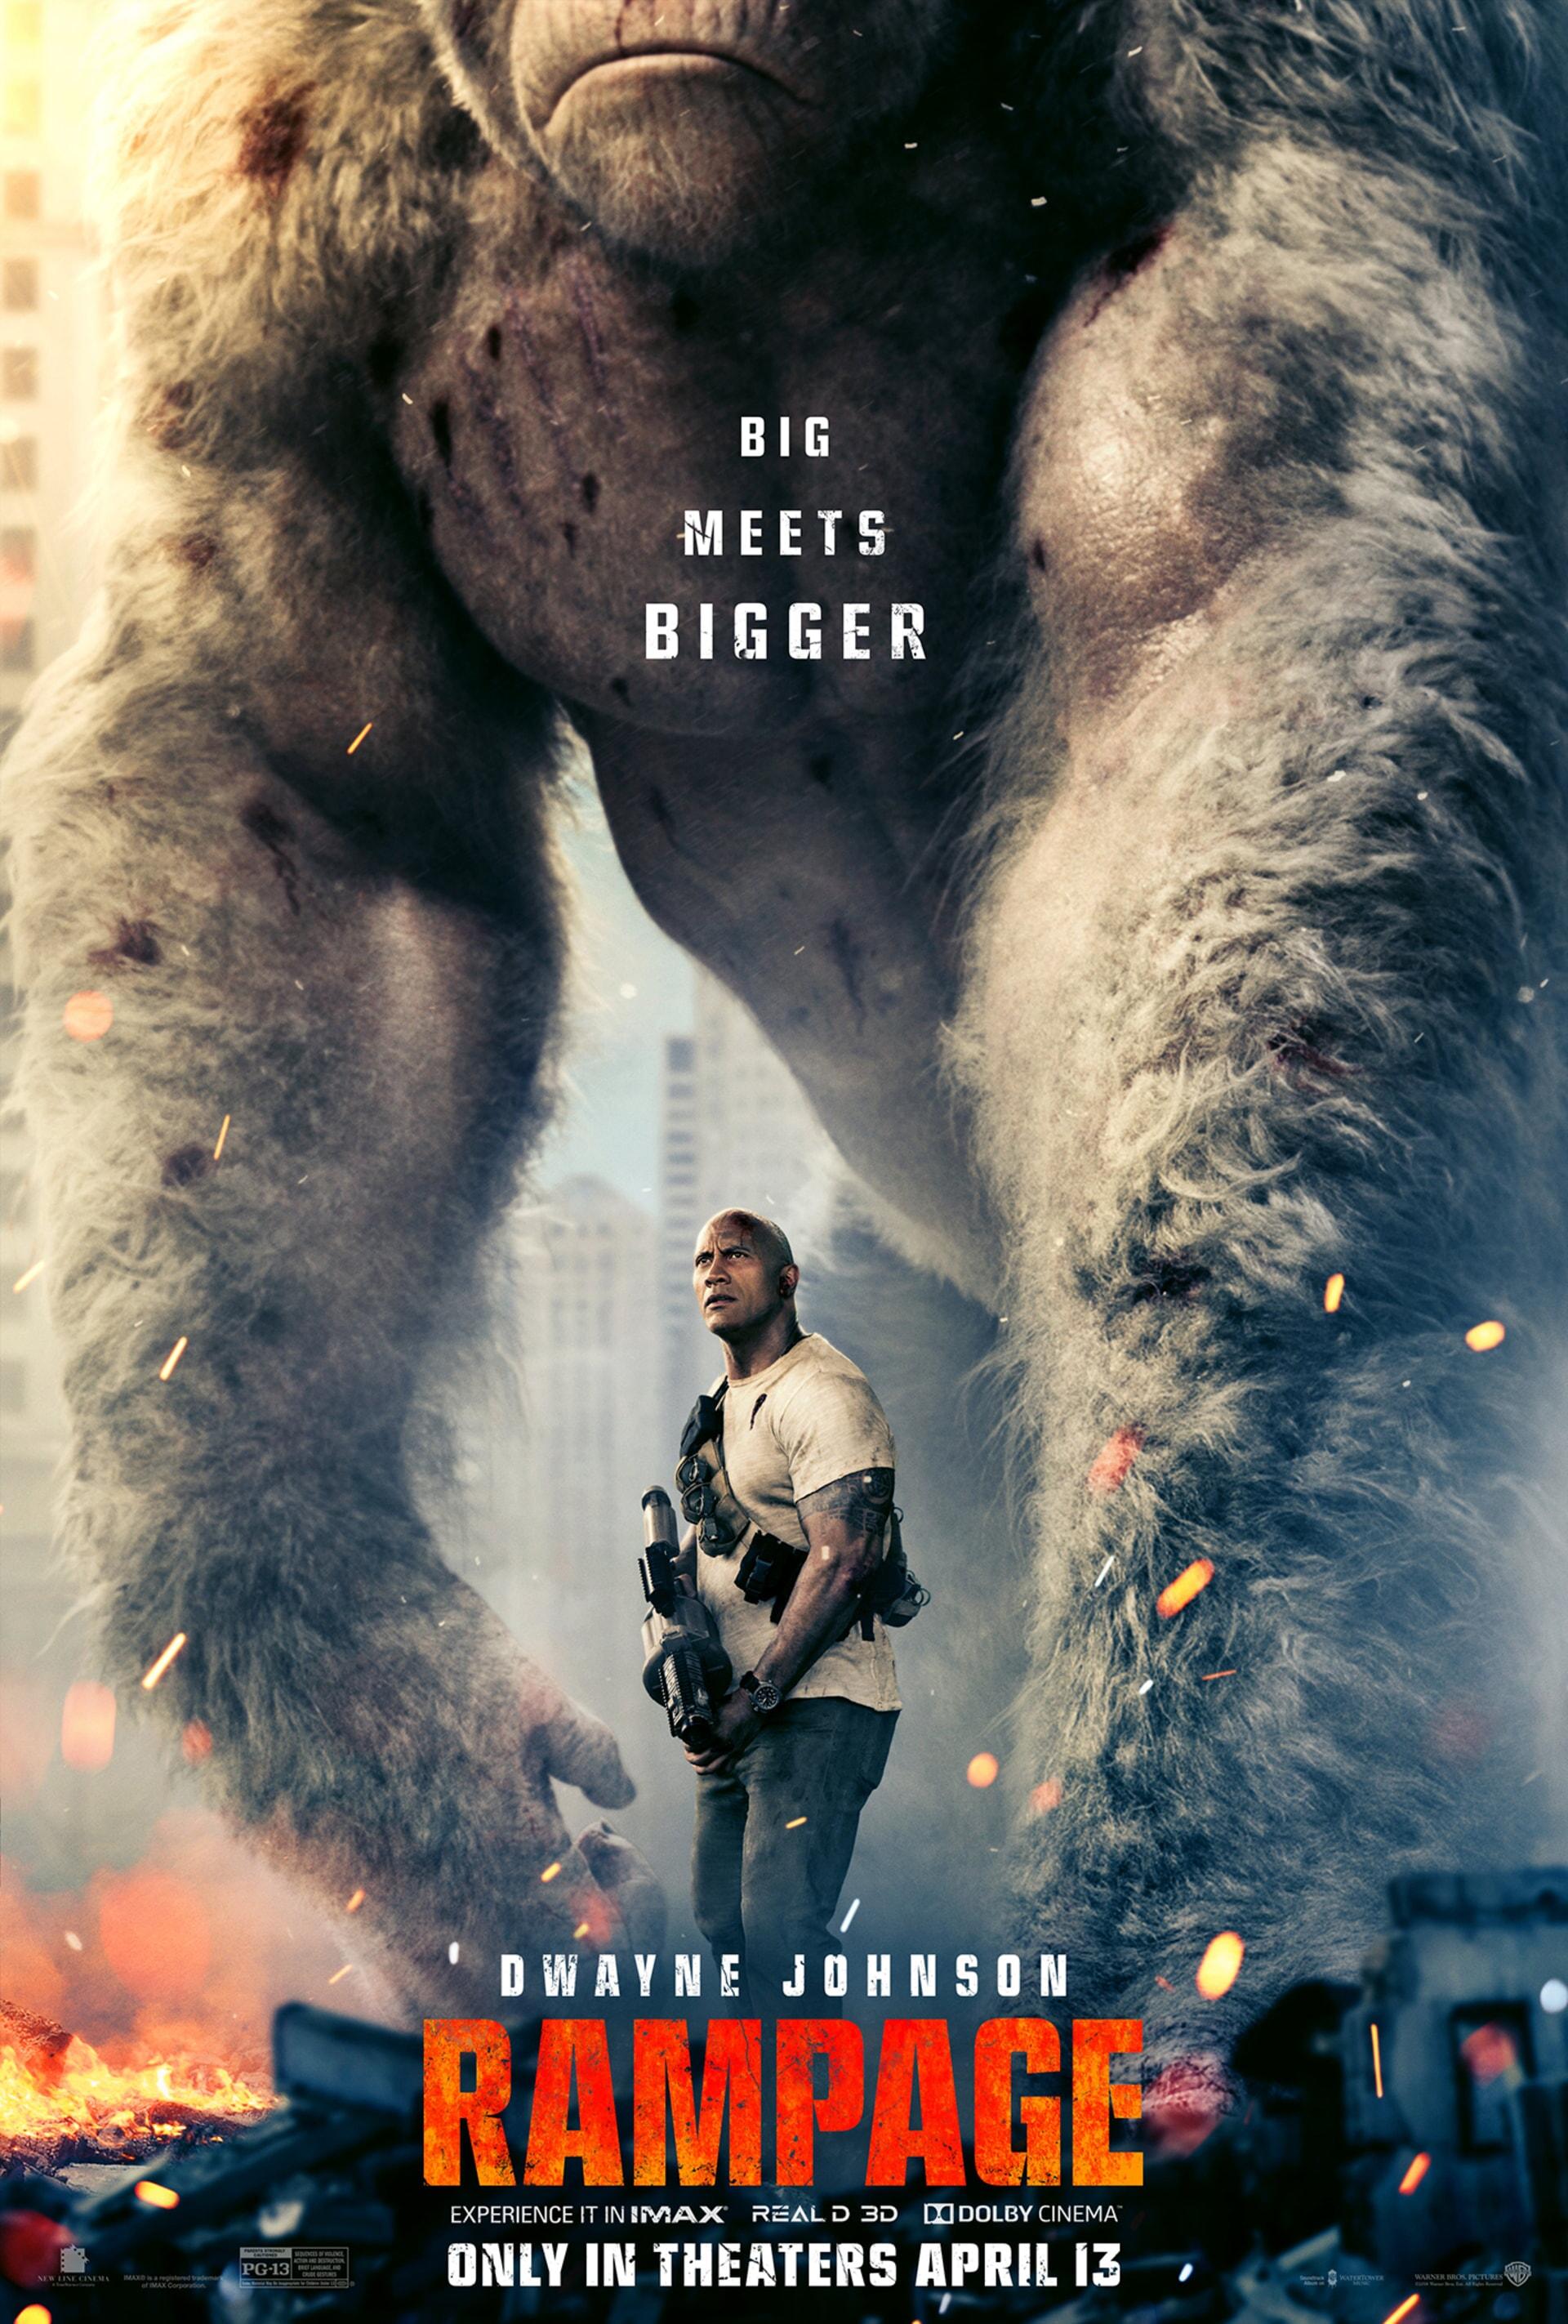 Dwayne Johnson standing under building-size gorilla in Rampage poster